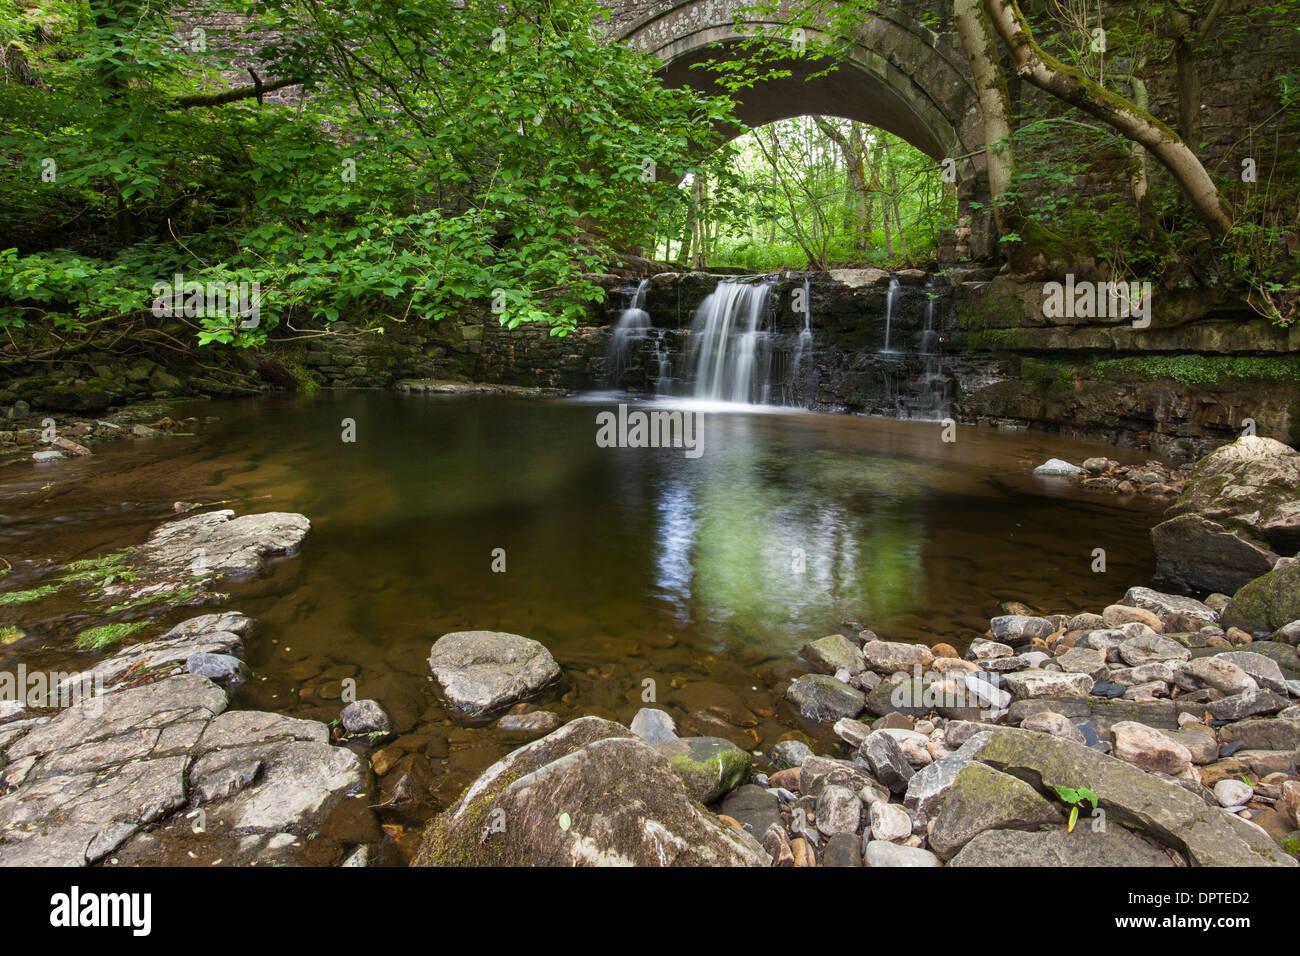 Waterfall on Bowlees Besck, Bowless, Upper Teesdale, England - Stock Image